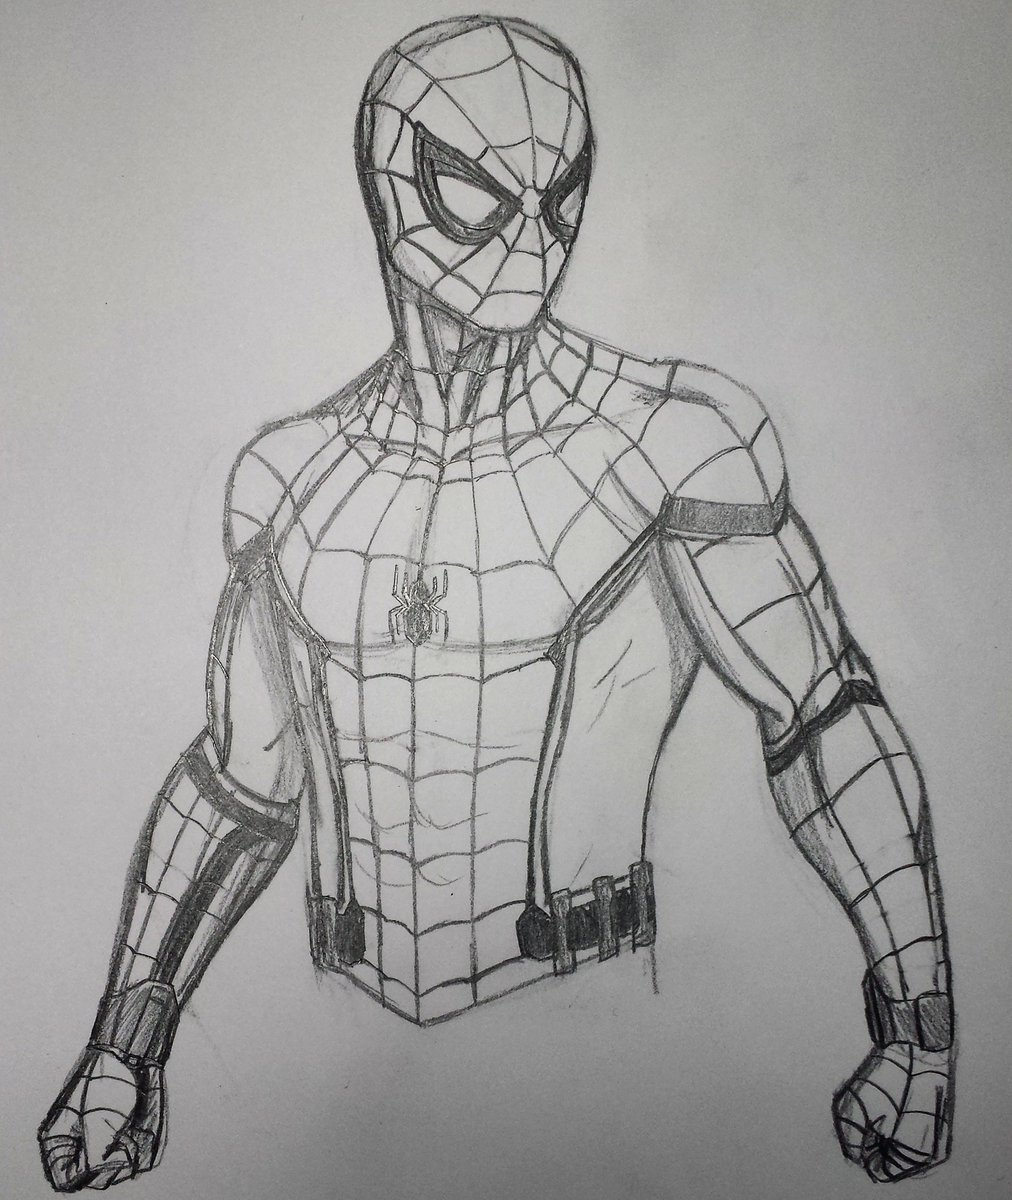 Tevin jones on twitter mcu spider man sketch tomholland1996 spiderman teamironman captainamericacivilwar drawing marvel comics art